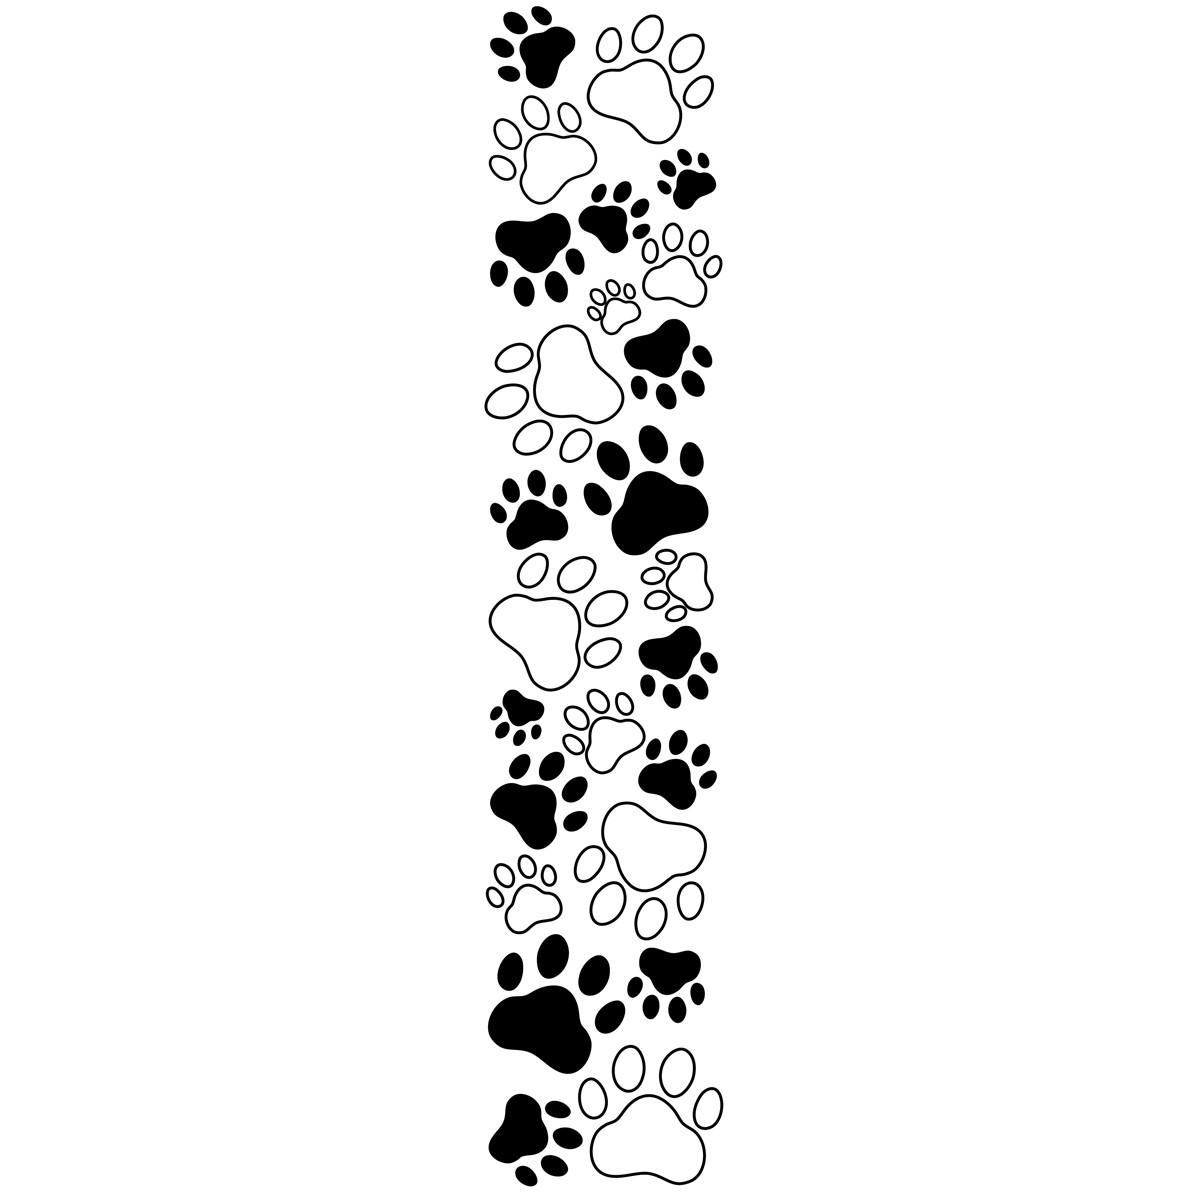 Dog Paw Print Clip Art | Clipart Panda - Free Clipart Images